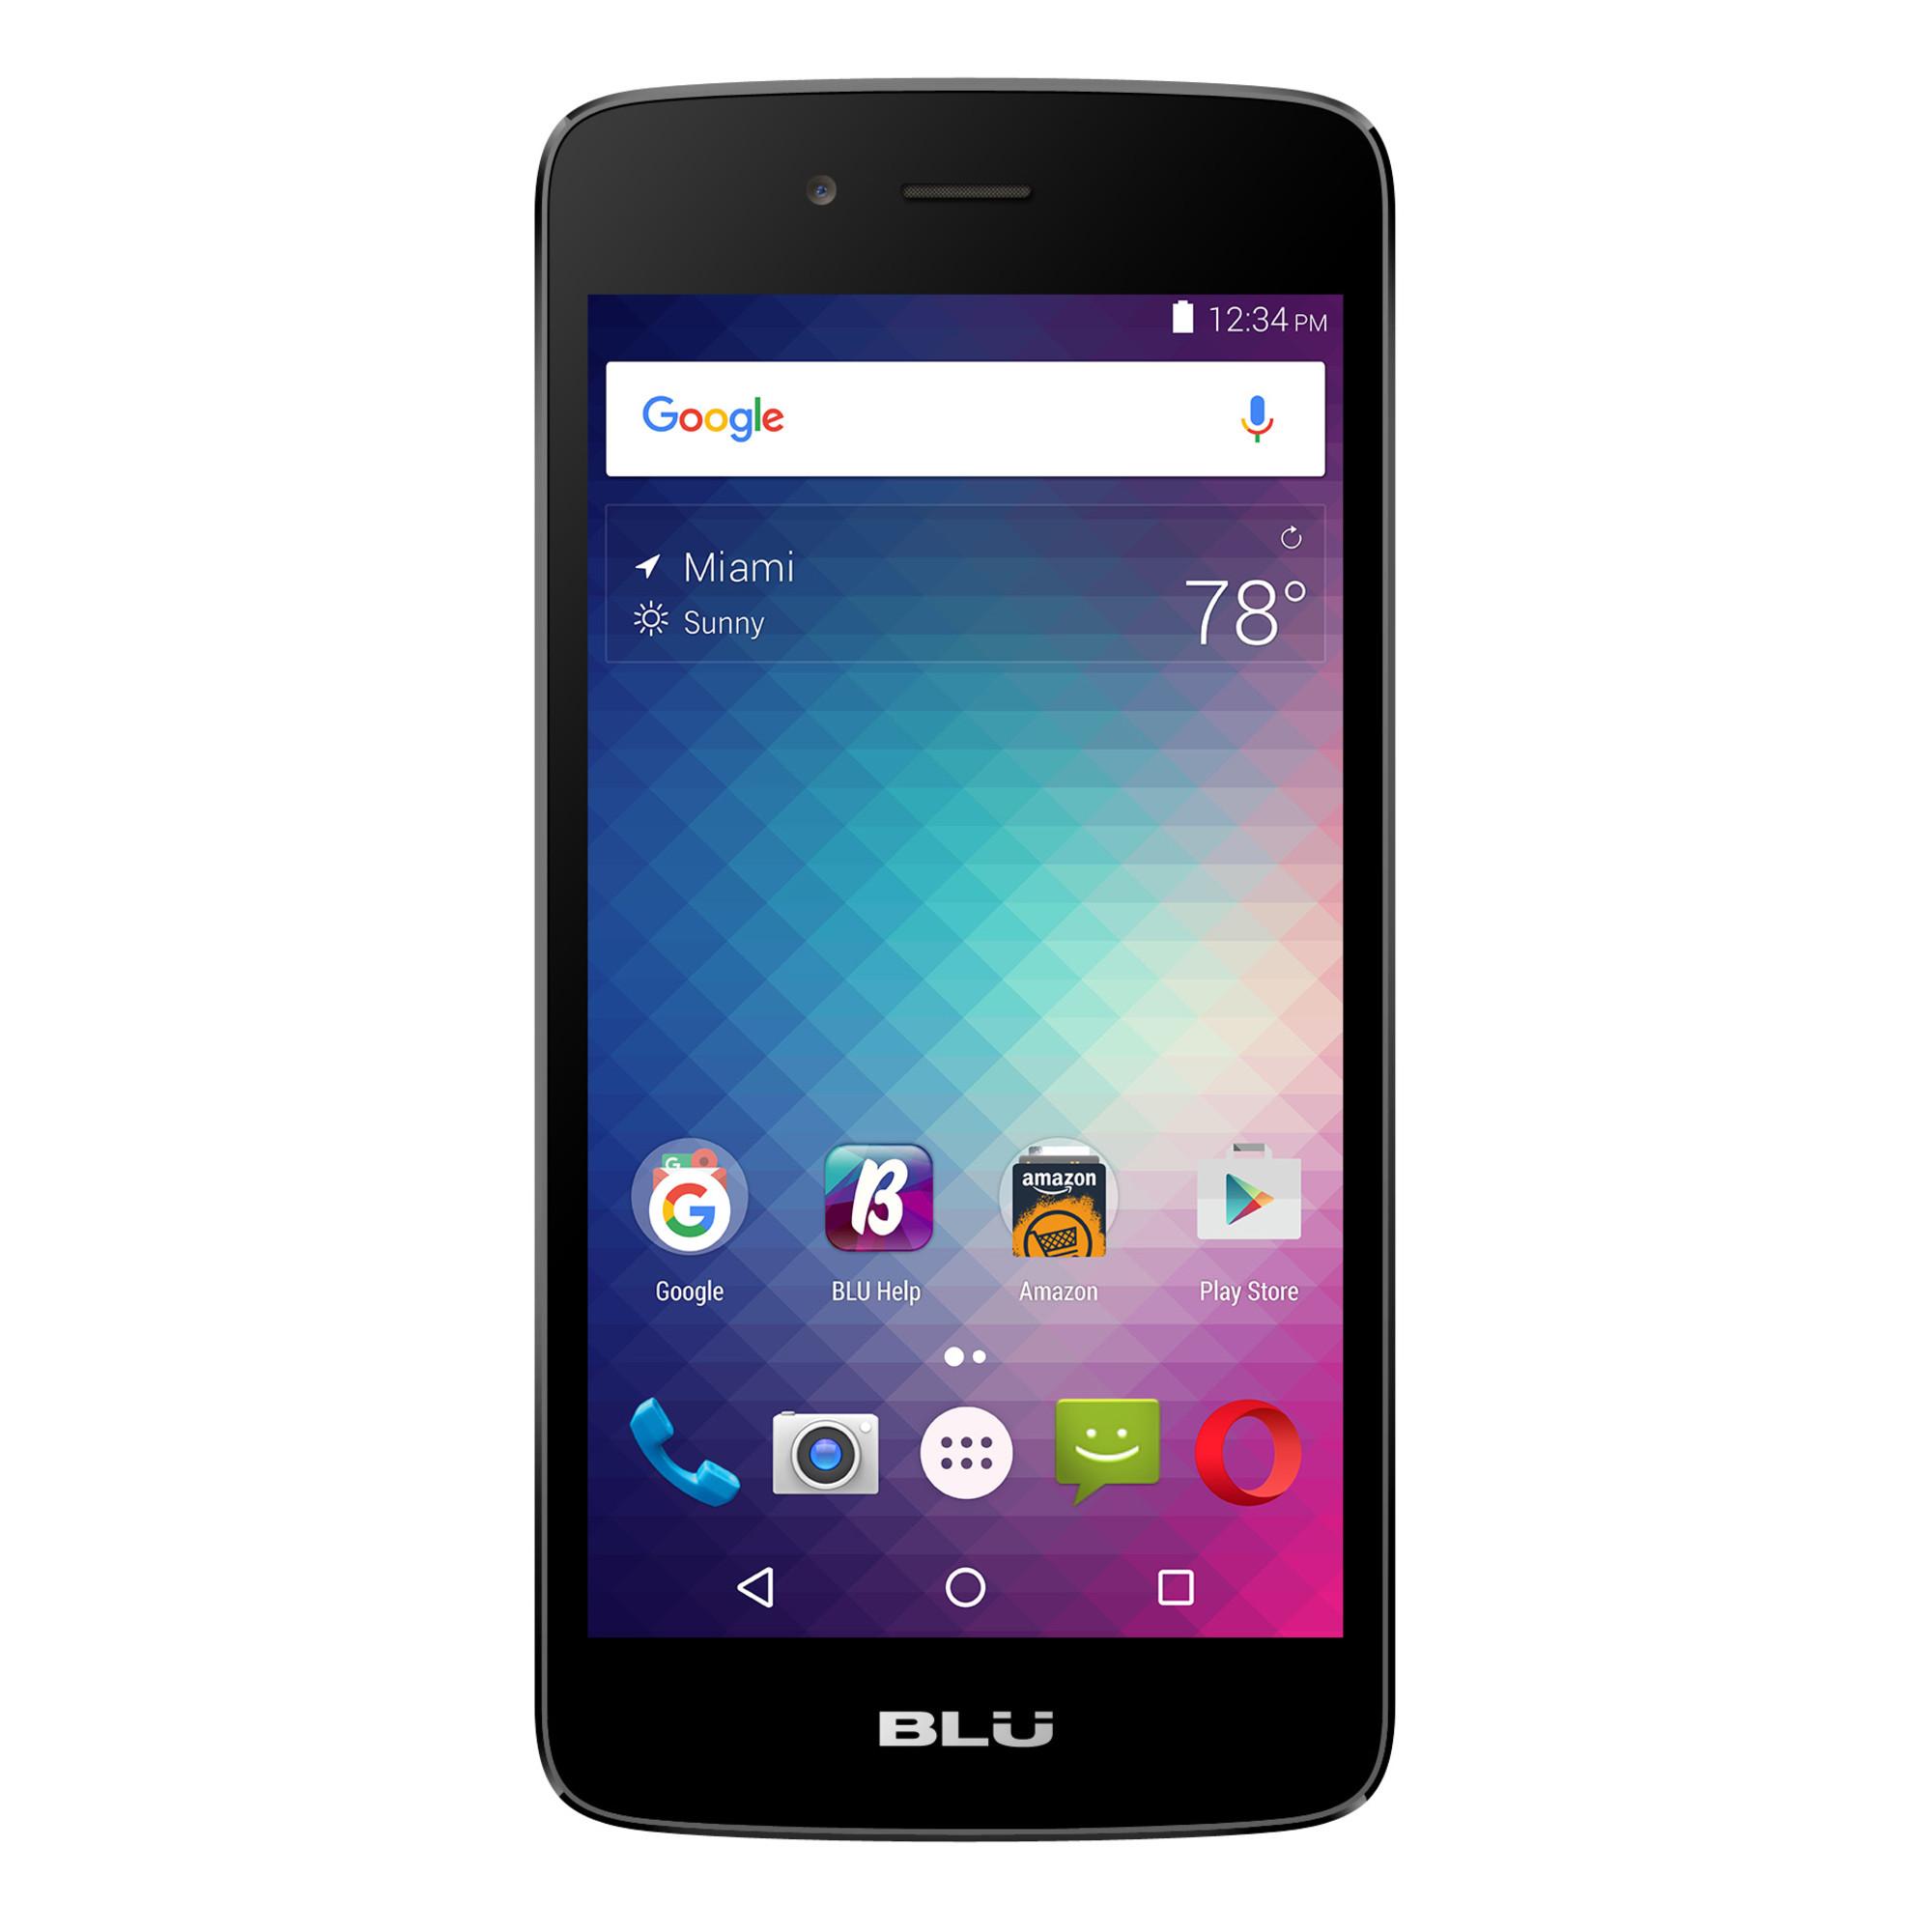 Android Diamond: BLU Diamond M D210U Unlocked GSM Quad-Core Android Phone